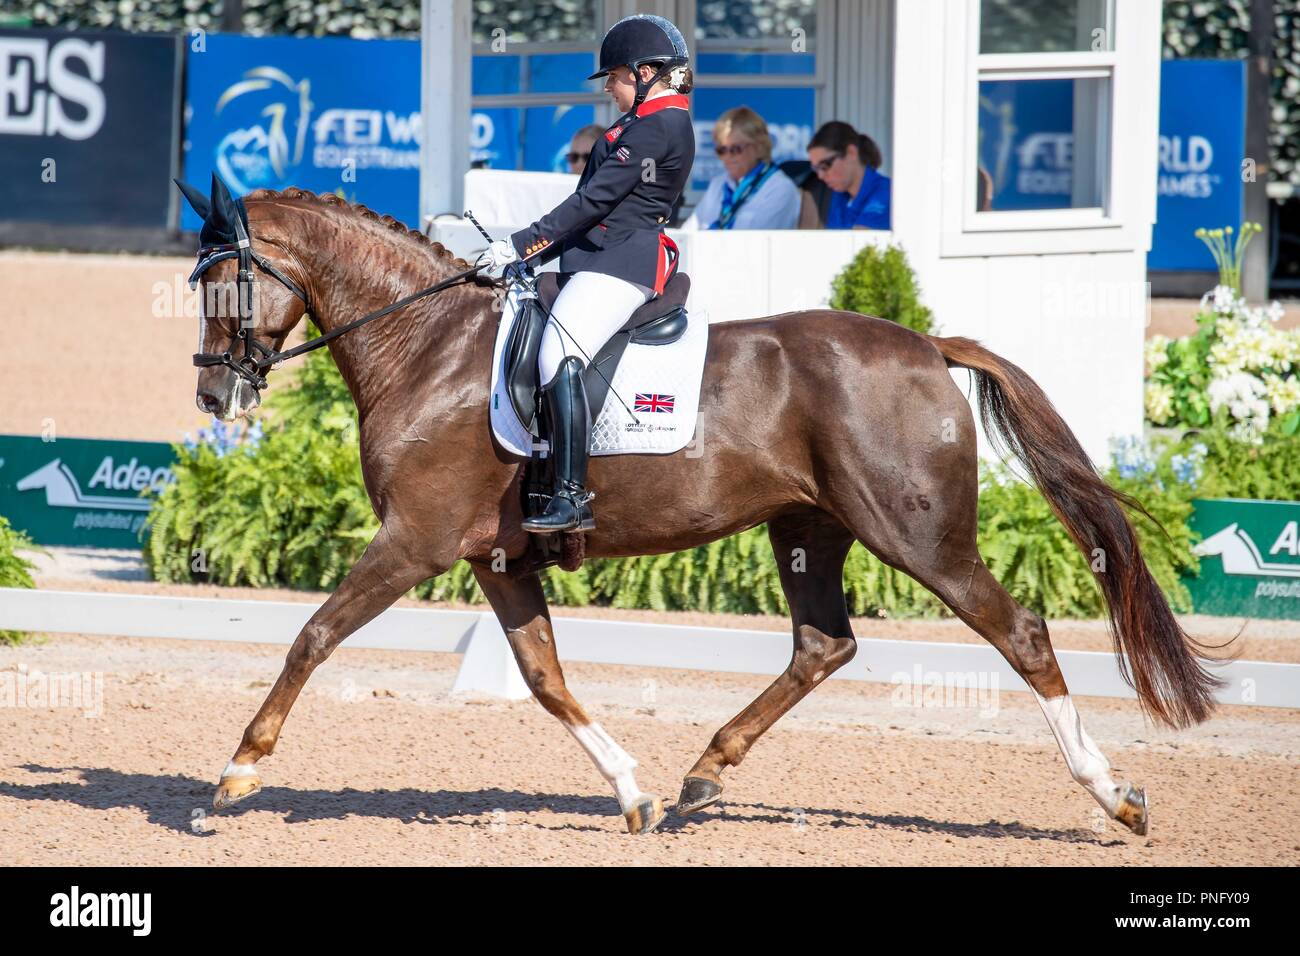 Natasha Baker. Mount St John Diva Dannebrog. GBR. Team Test Grade III Para Dressage.Day 10. World Equestrian Games. WEG 2018 Tryon. North Carolina. USA. 21/09/2018. - Stock Image